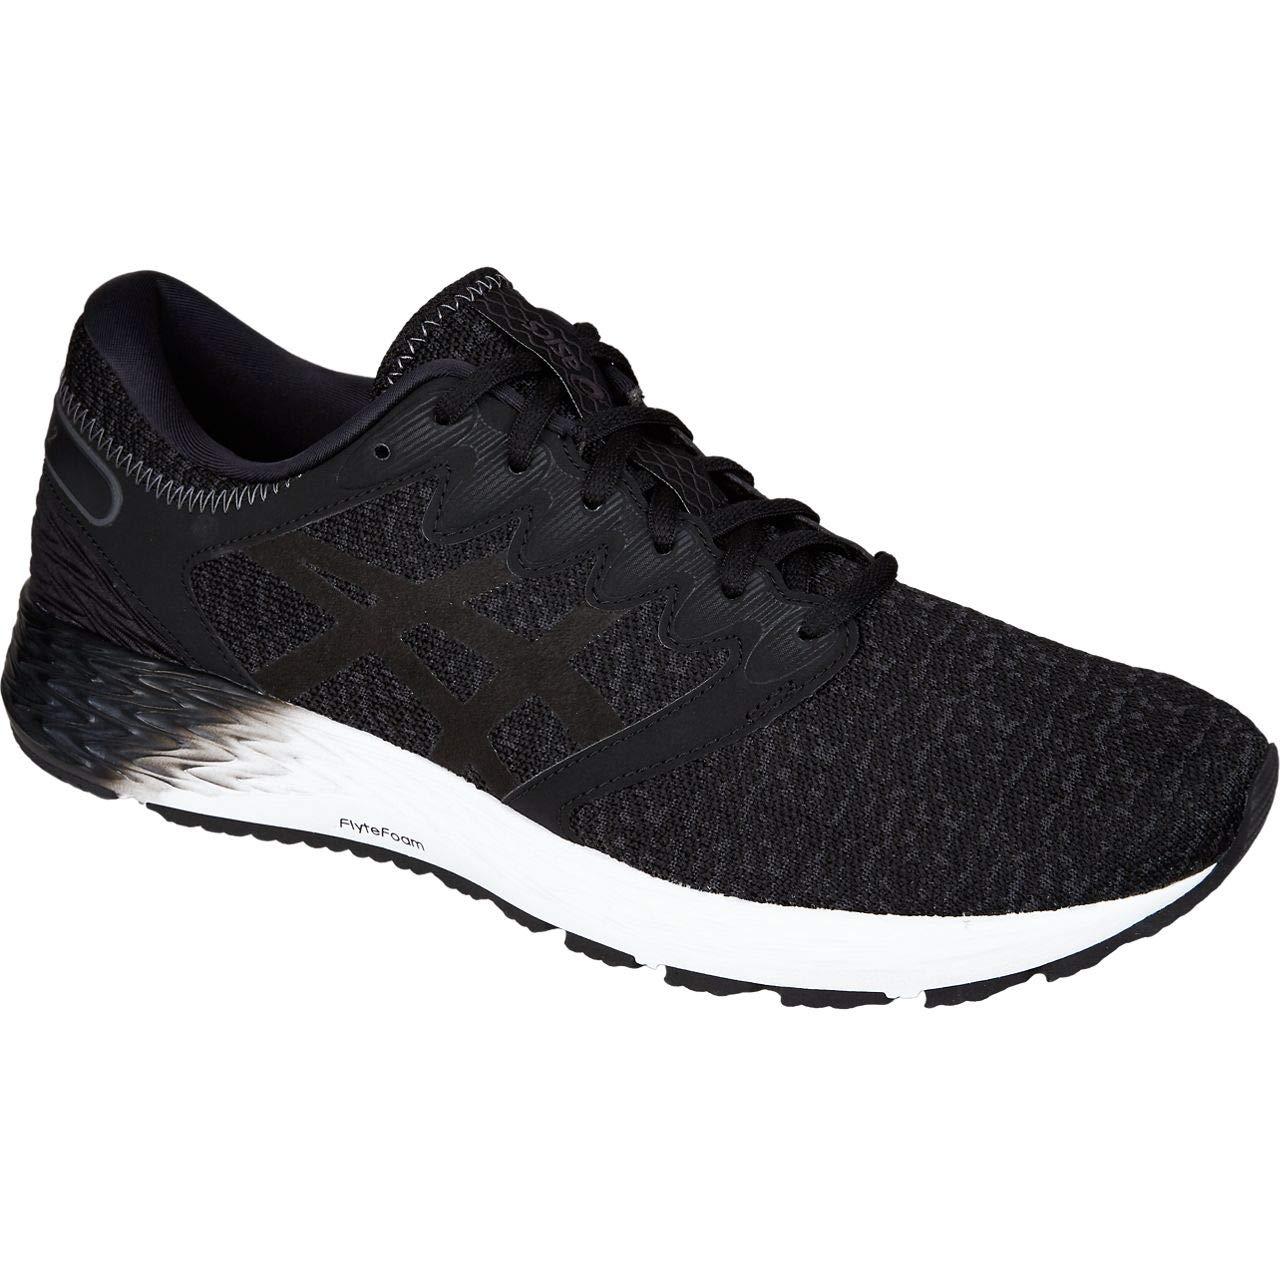 0f0a1774e67a ASICS Roadhawk FF 2 MX Running Shoes - SS19 Grey  Amazon.co.uk  Shoes   Bags